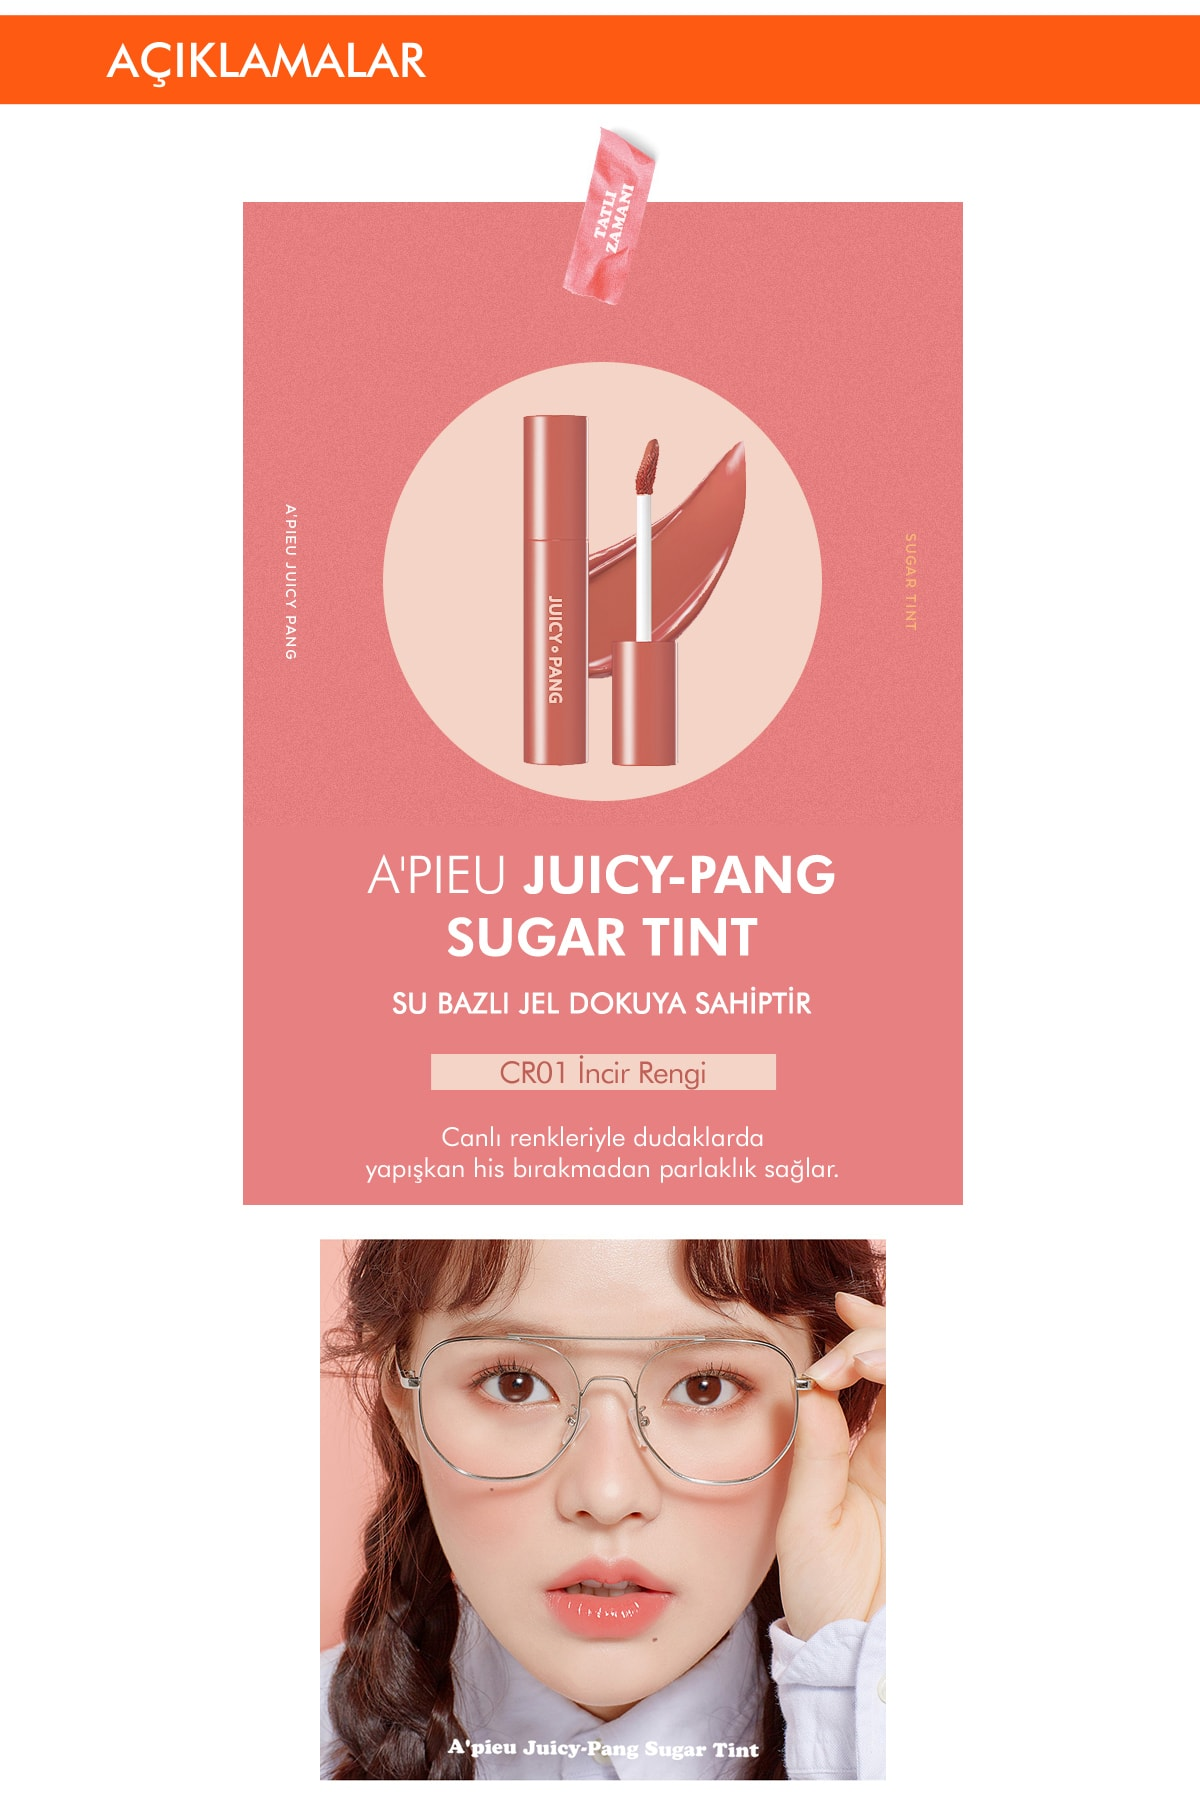 Missha Uzun Süre Kalıcı Parlak Su Bazlı Jel Tint APIEU Juicy-Pang Sugar Tint (CR01) 2